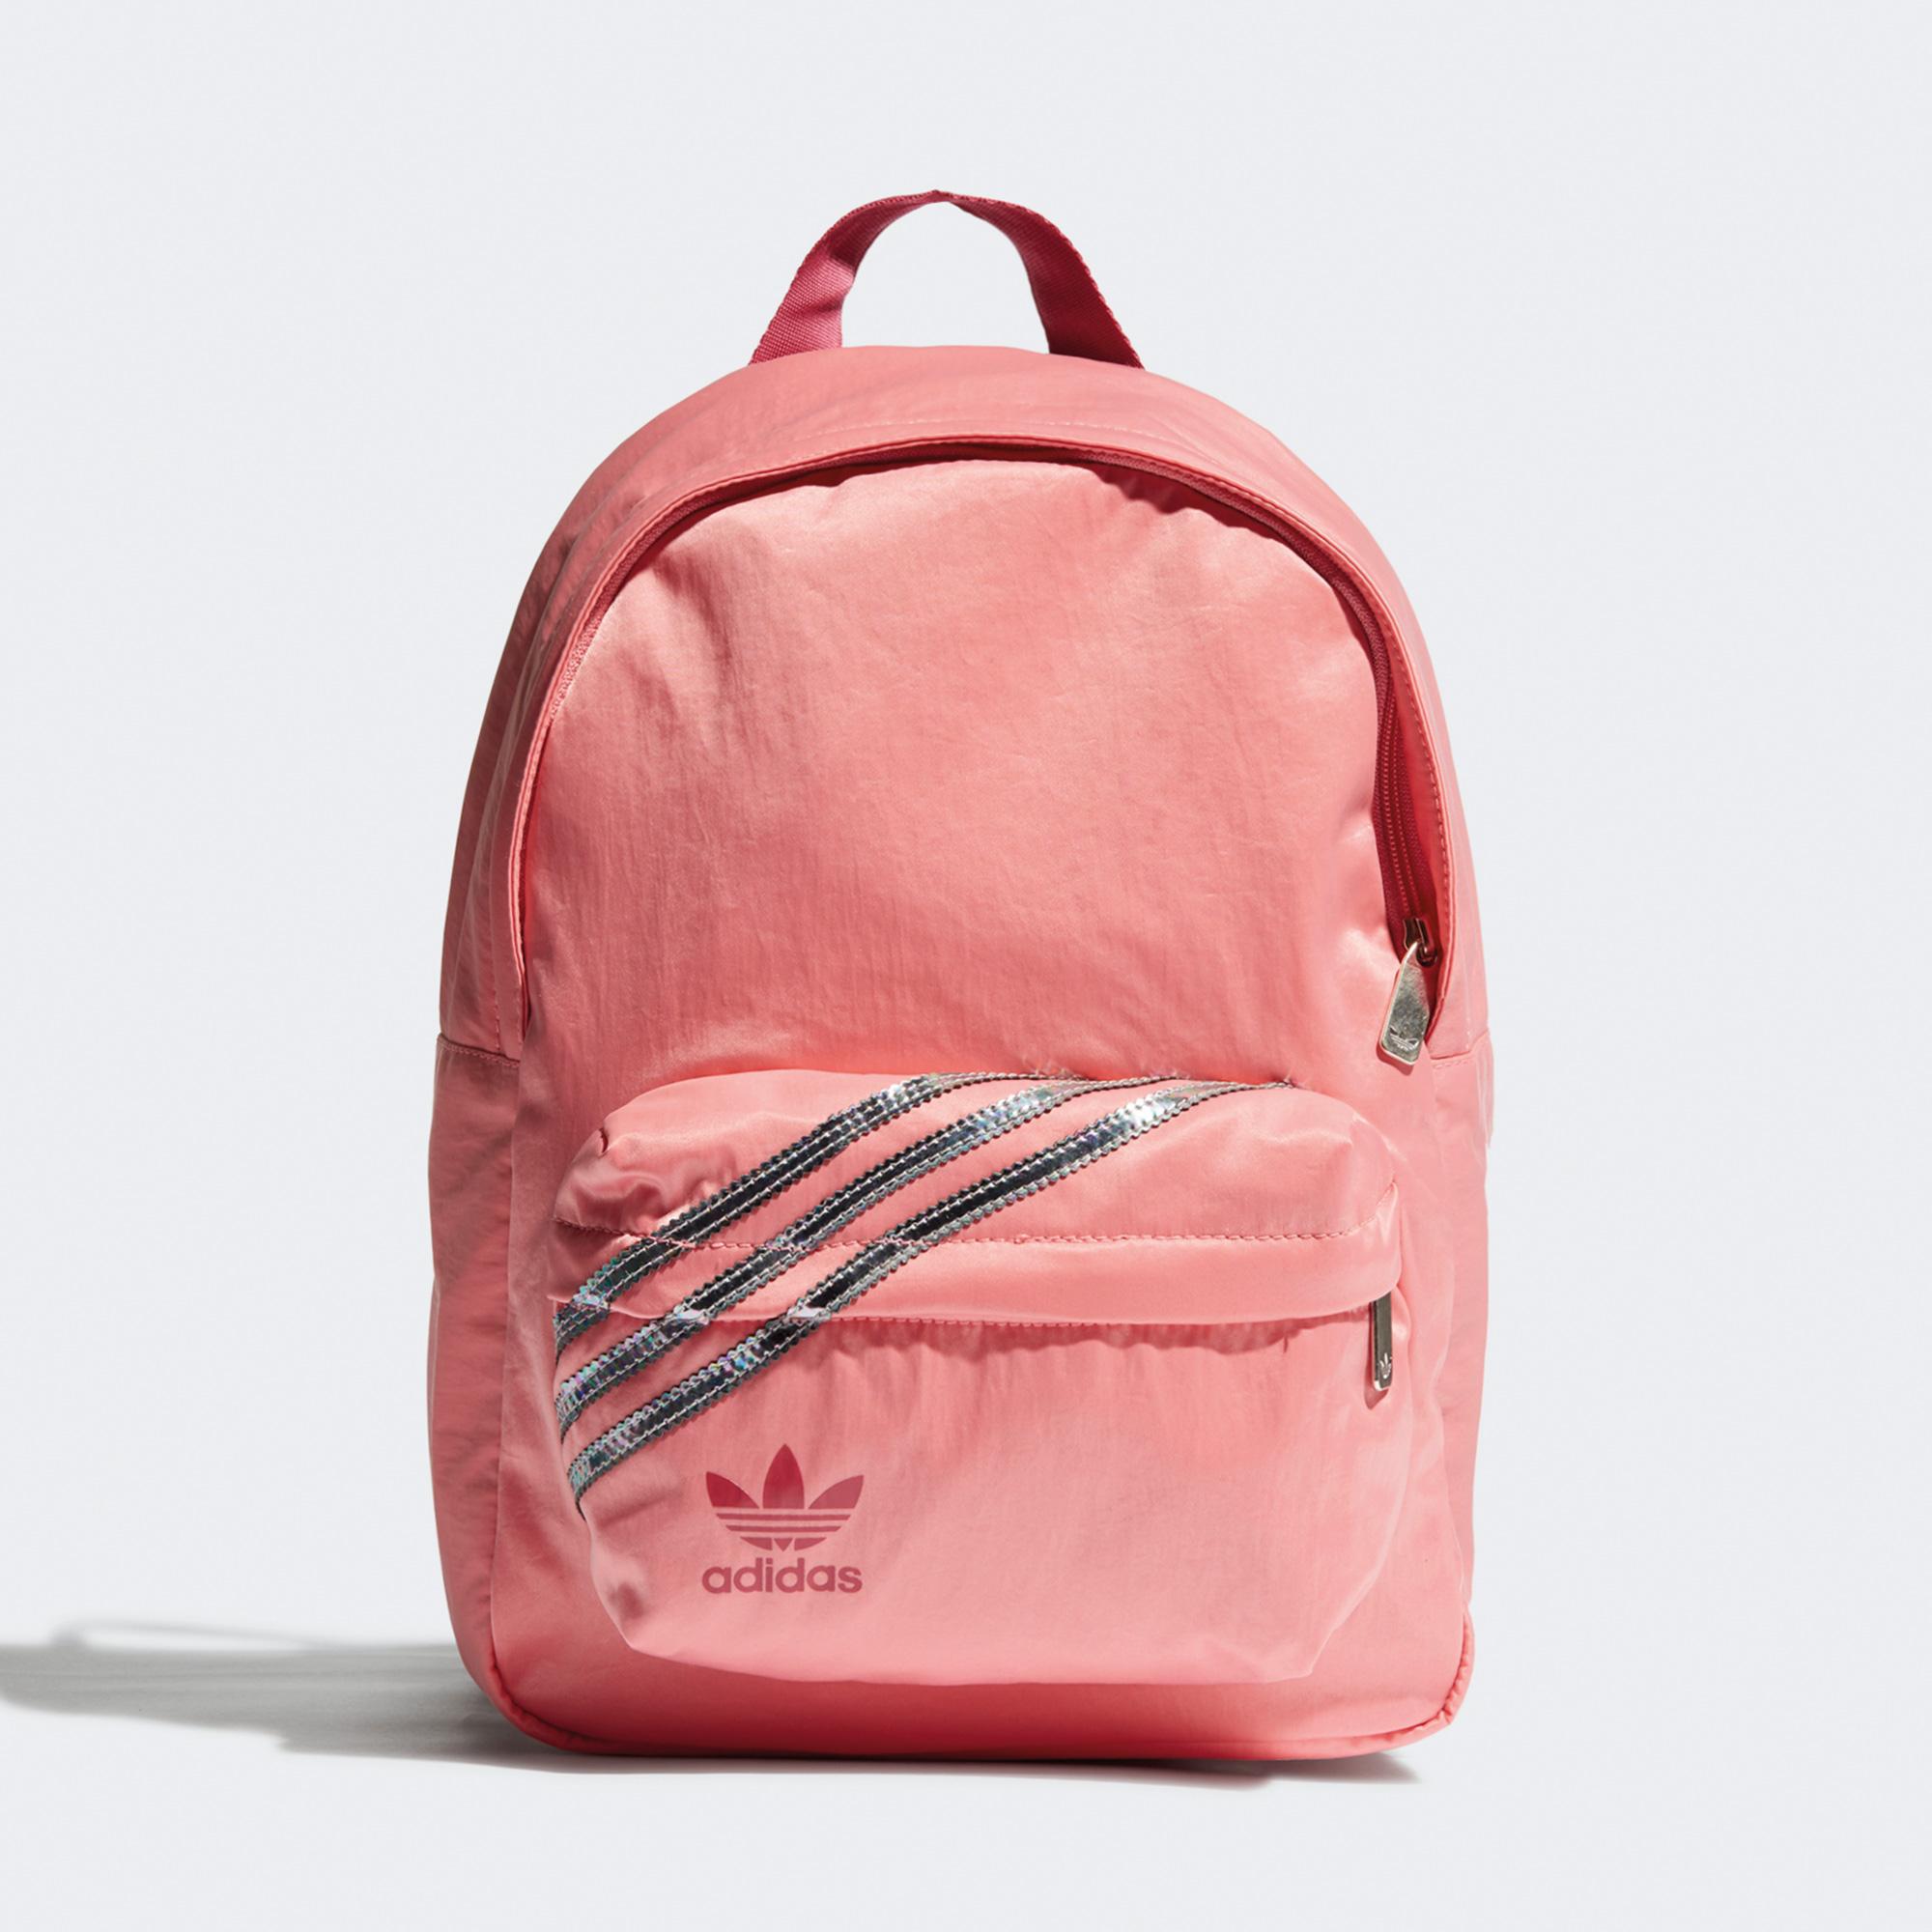 adidas Nylon Unisex Pembe Sırt Çantası